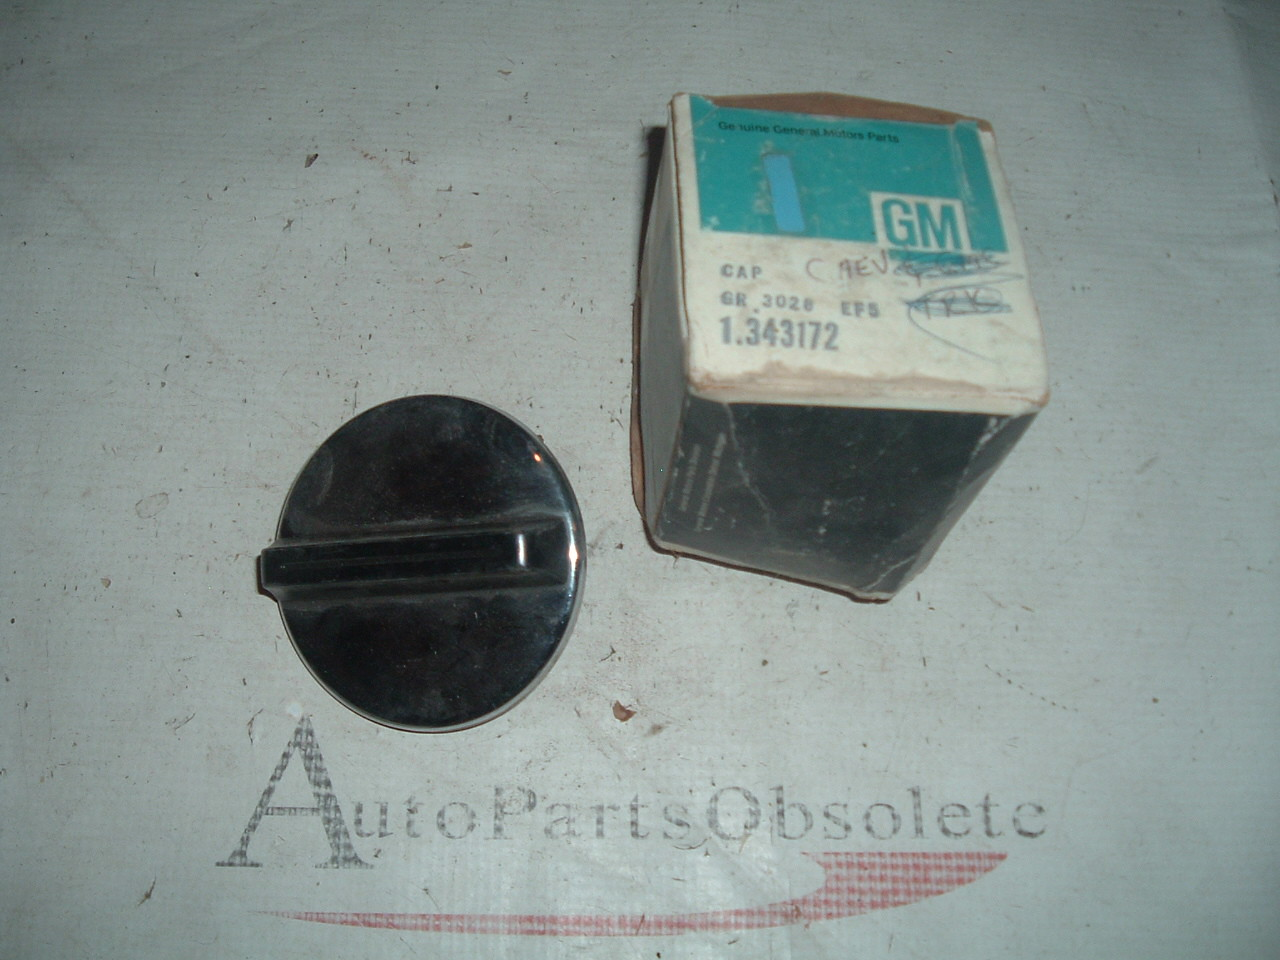 1973 74 75 chevrolet /gmc truck gas cap # 343172 (z 343172)